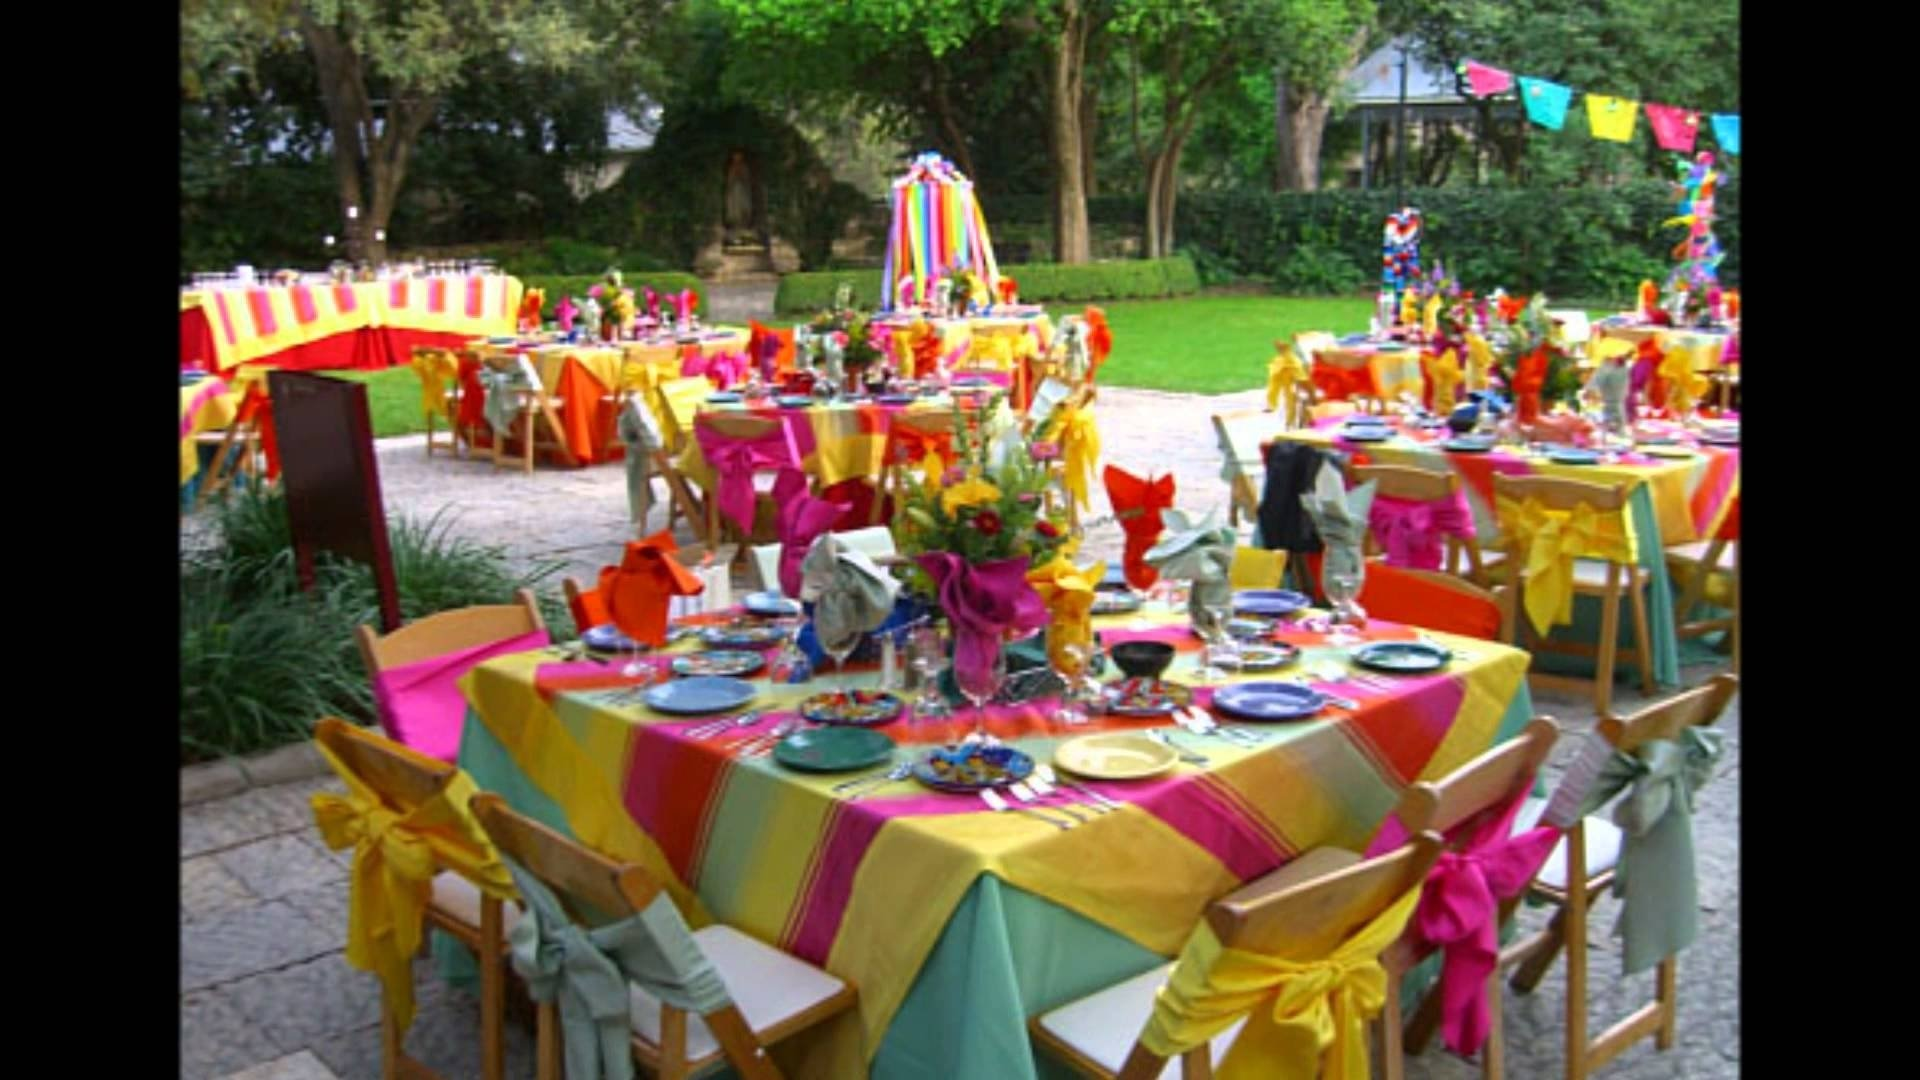 10 Fantastic Kids Birthday Party Entertainment Ideas creative birthday party ideas for your kids youtube 2 2021